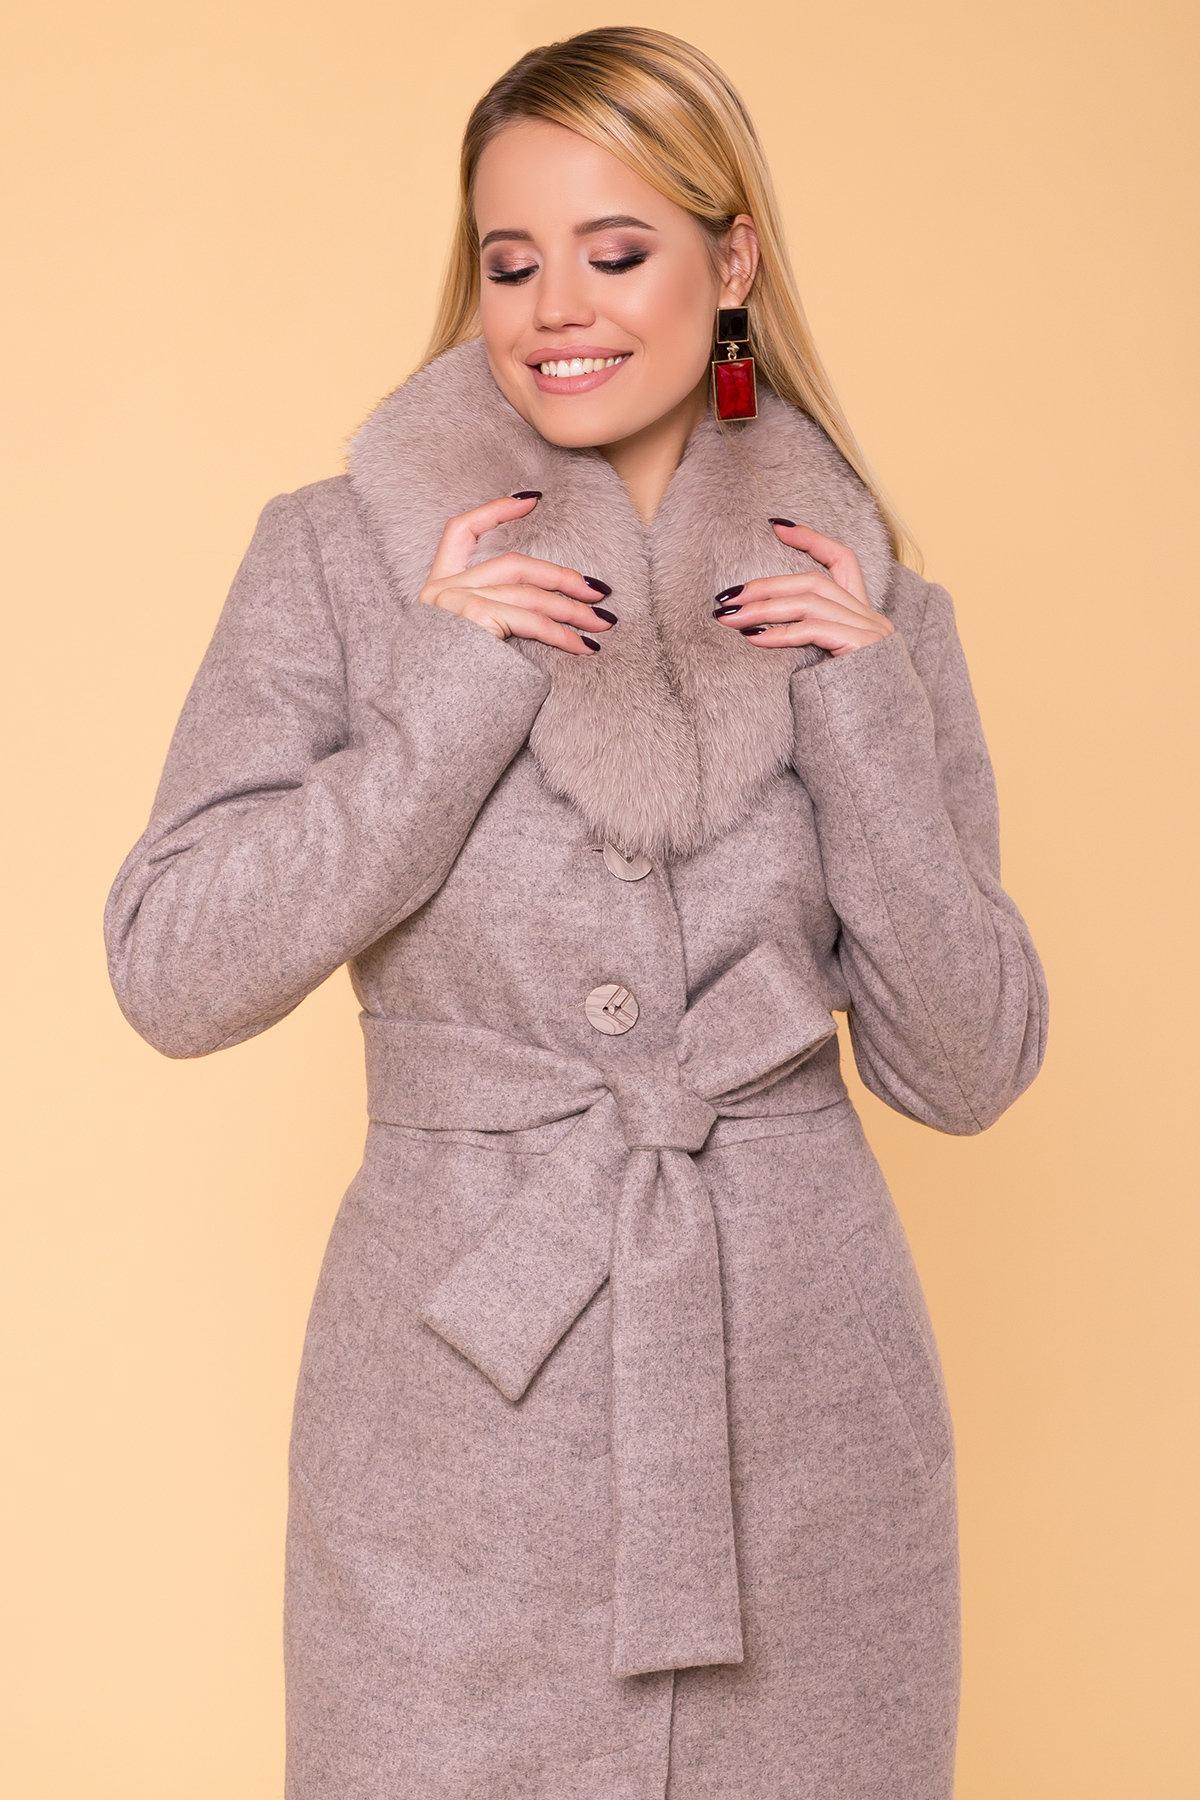 Пальто зима Габриэлла макси 5890 АРТ. 39456 Цвет: Бежевый 31 - фото 5, интернет магазин tm-modus.ru